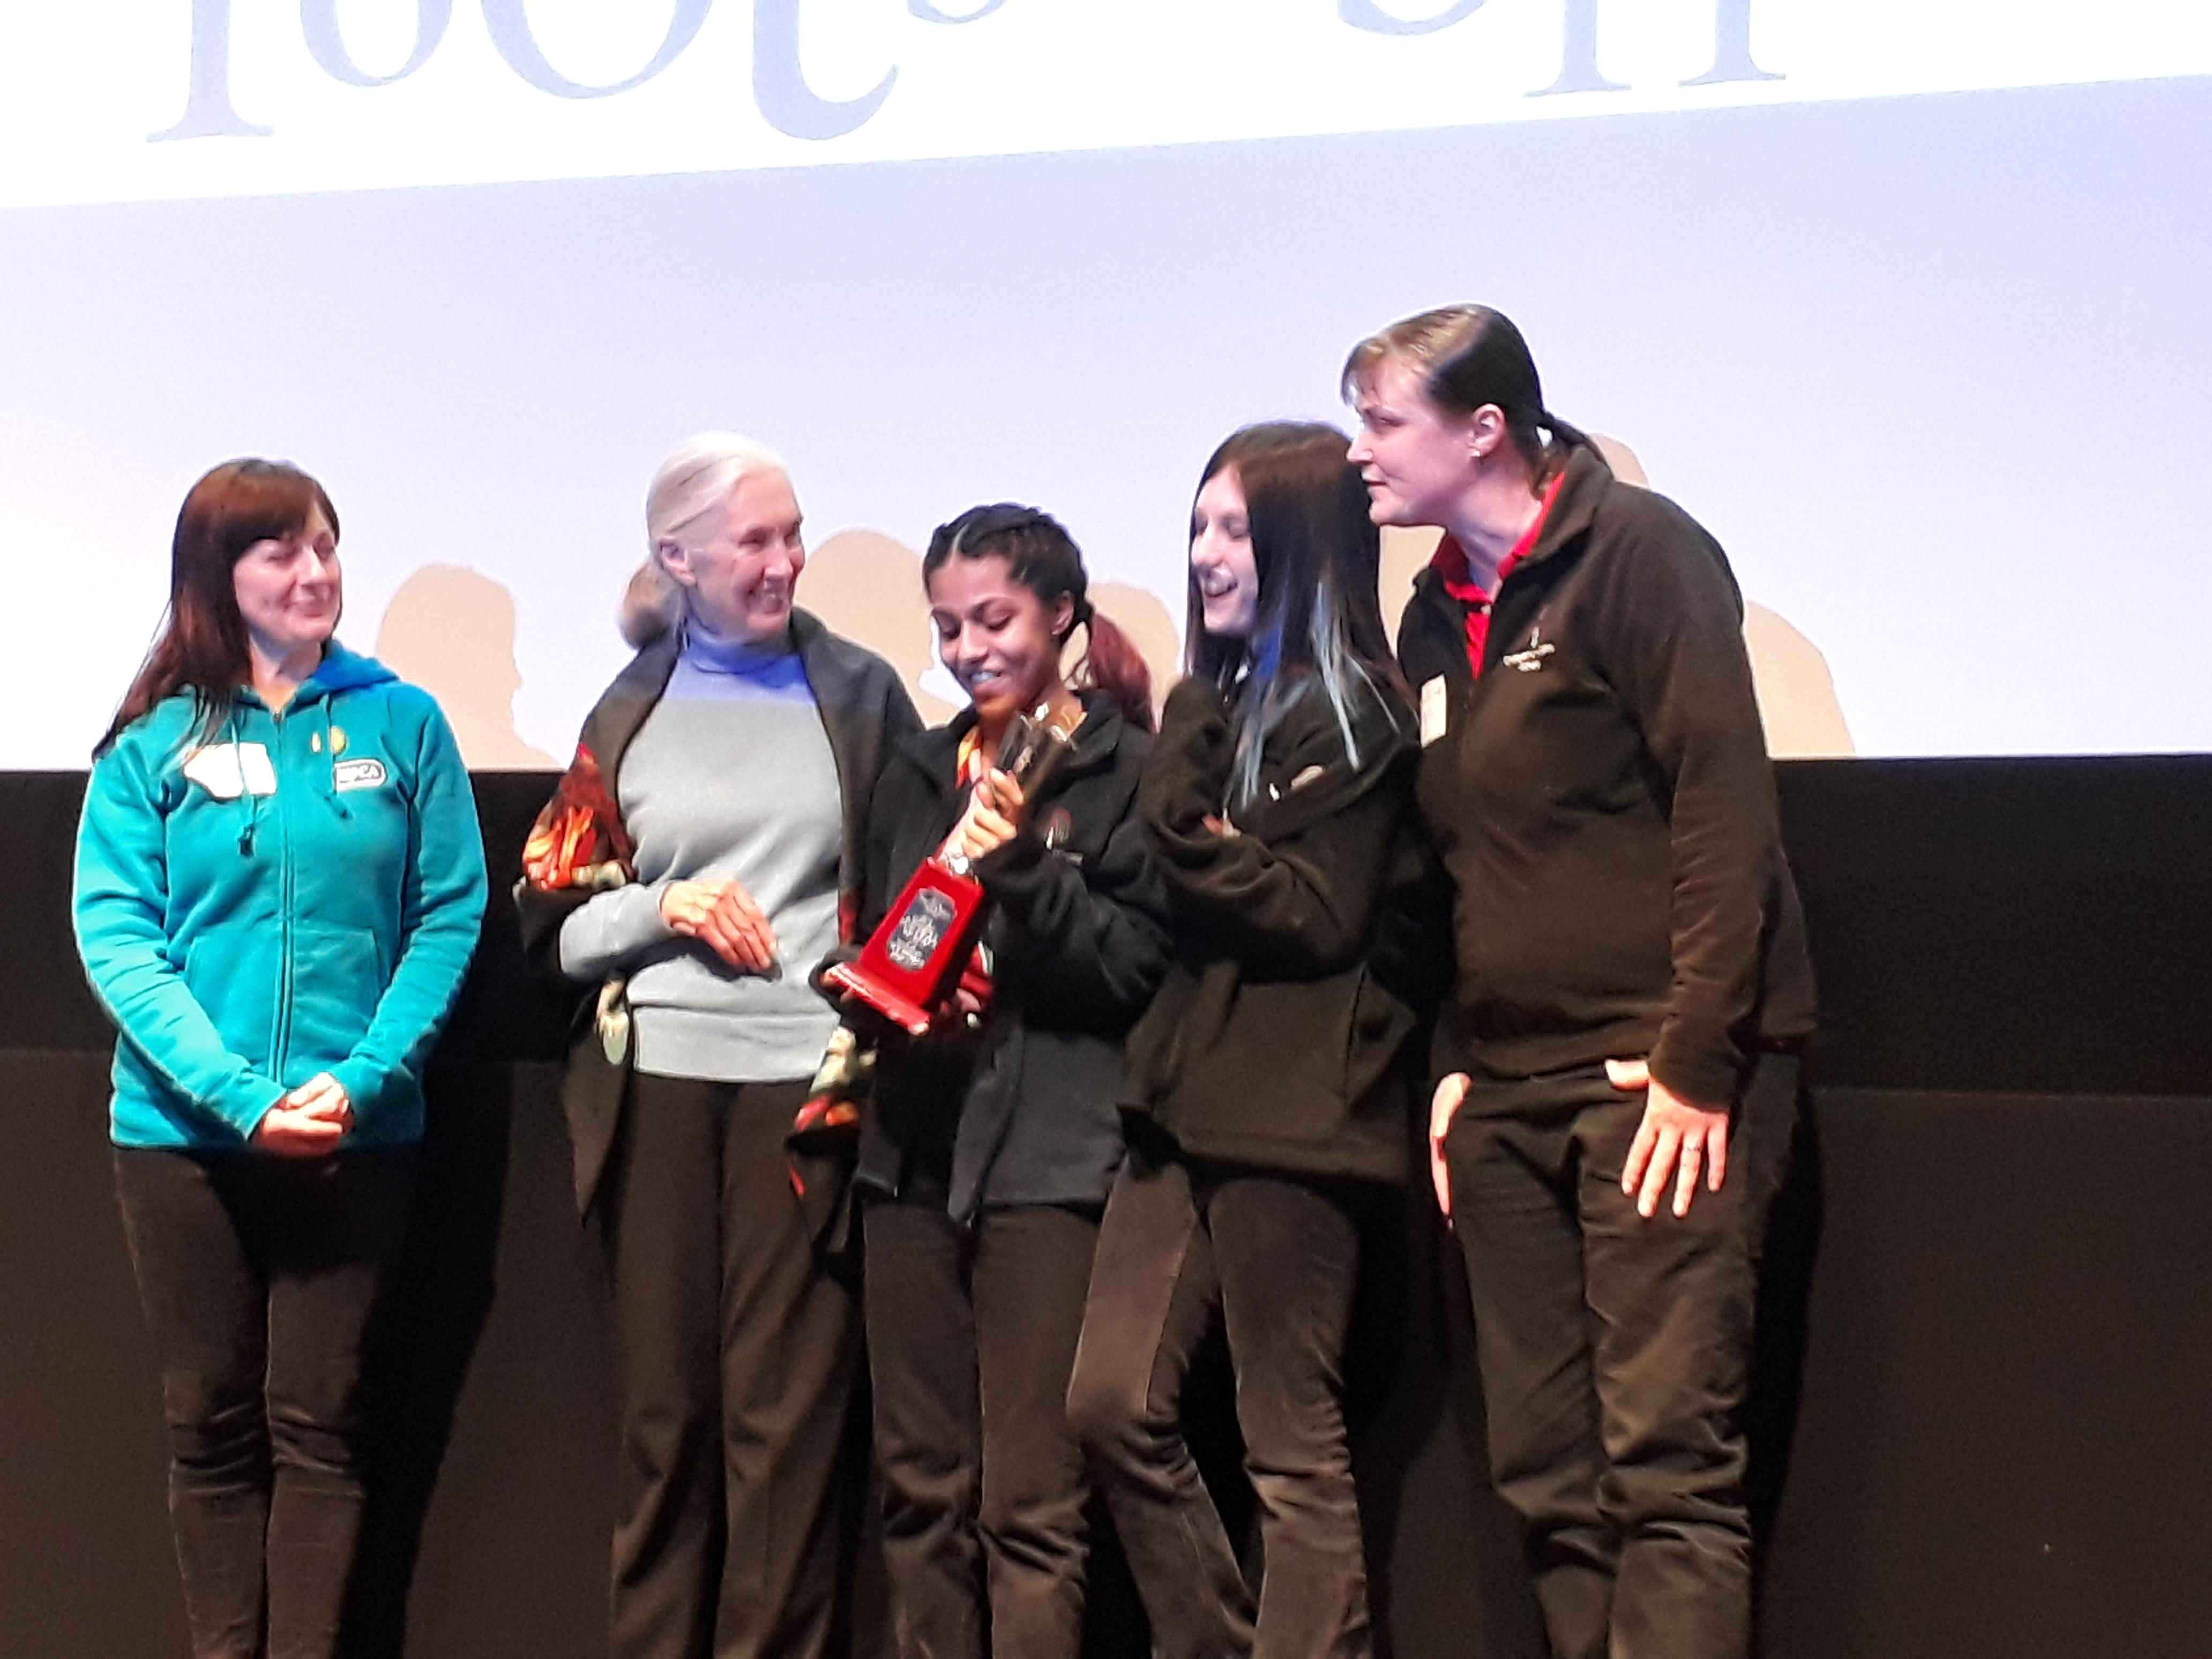 Most Outstanding Group Award: Children's Hospital School